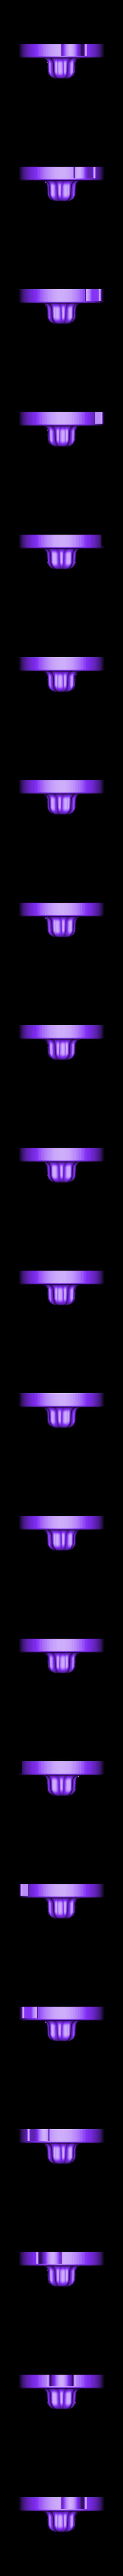 roue_1.stl Download free STL file Pocket Downfall - 10 de chute de poche • Design to 3D print, lipki